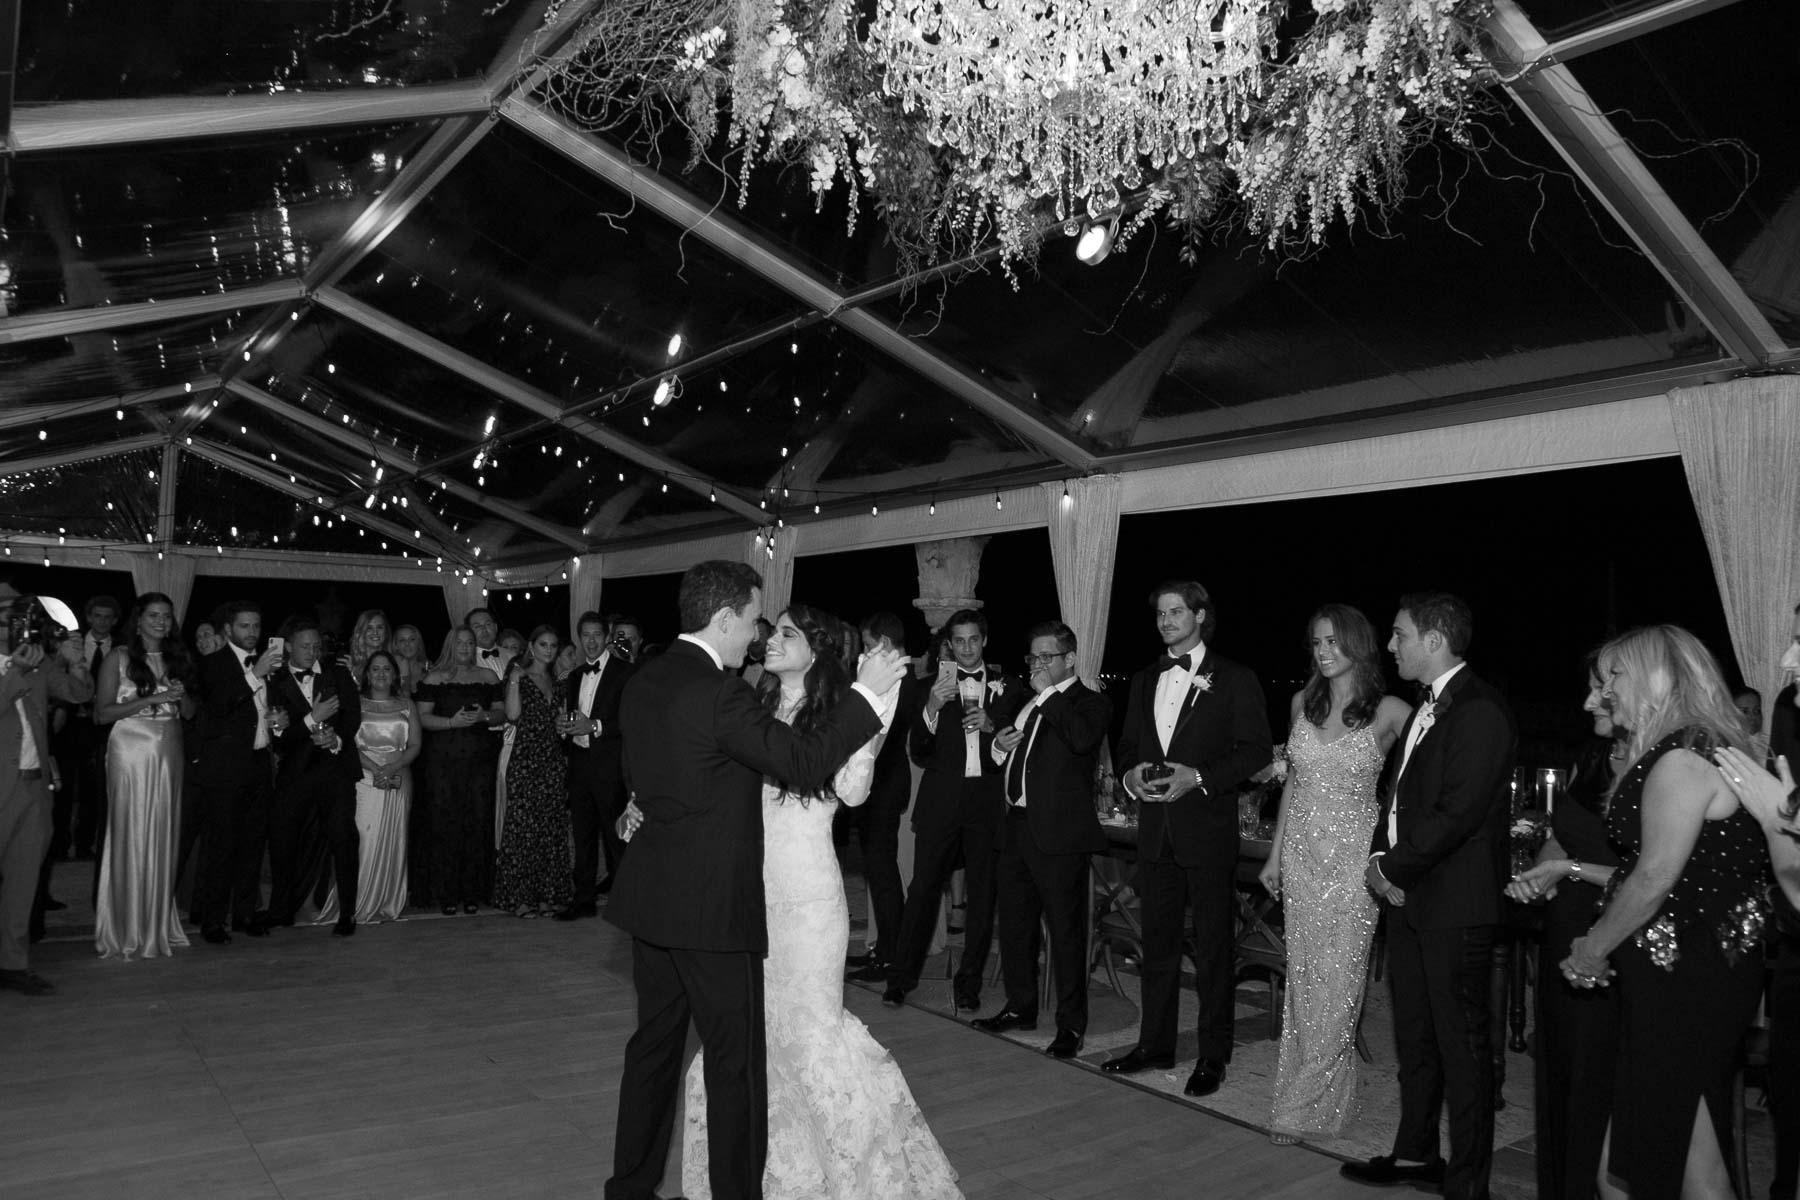 64-vizcaya-museum-wedding-photography.jpg